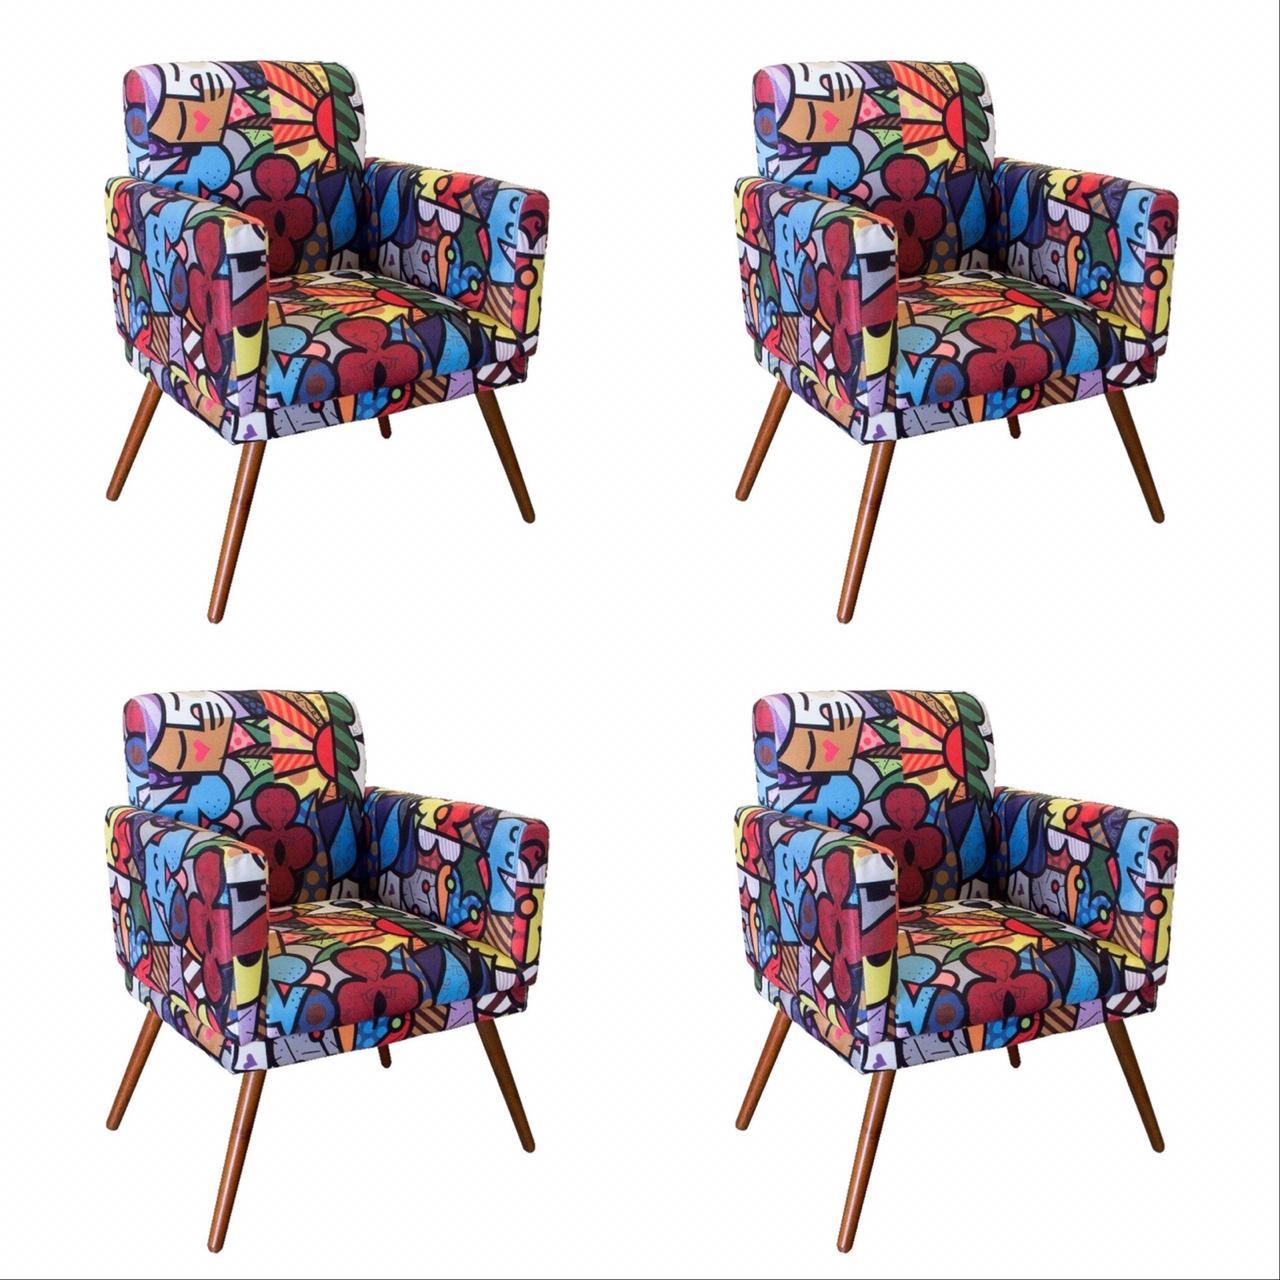 Kit 04 Poltrona Decorativa Nina com rodapés Romero Brito- Bela Casa Shop